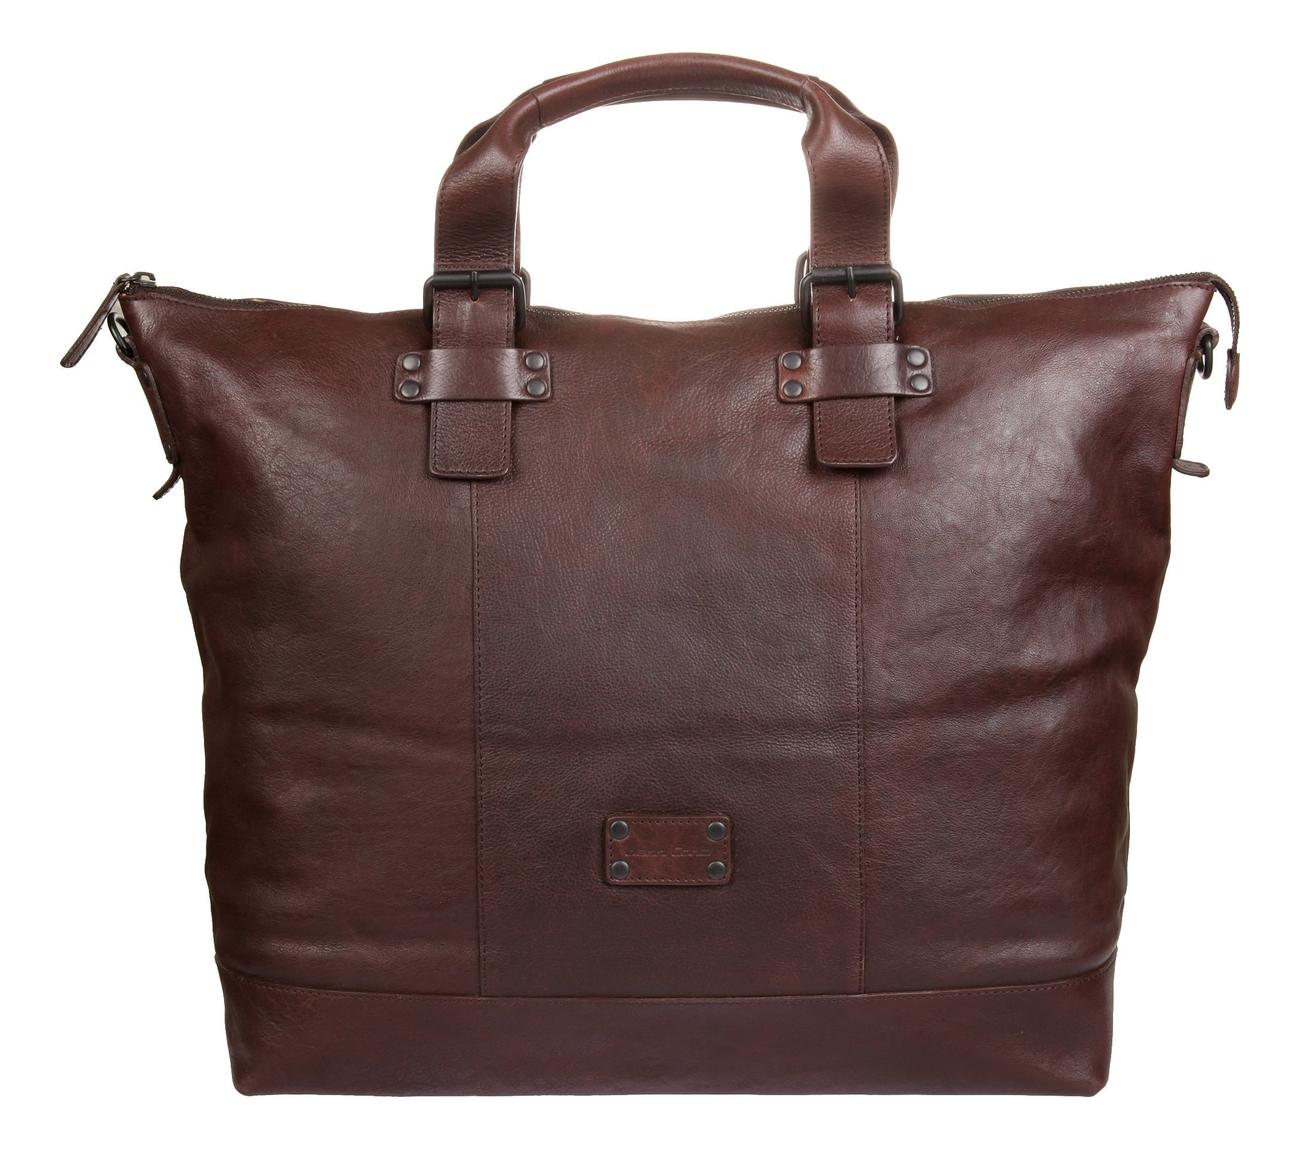 Дорожная сумка Dark Brown 1132074 (коричневая) фото